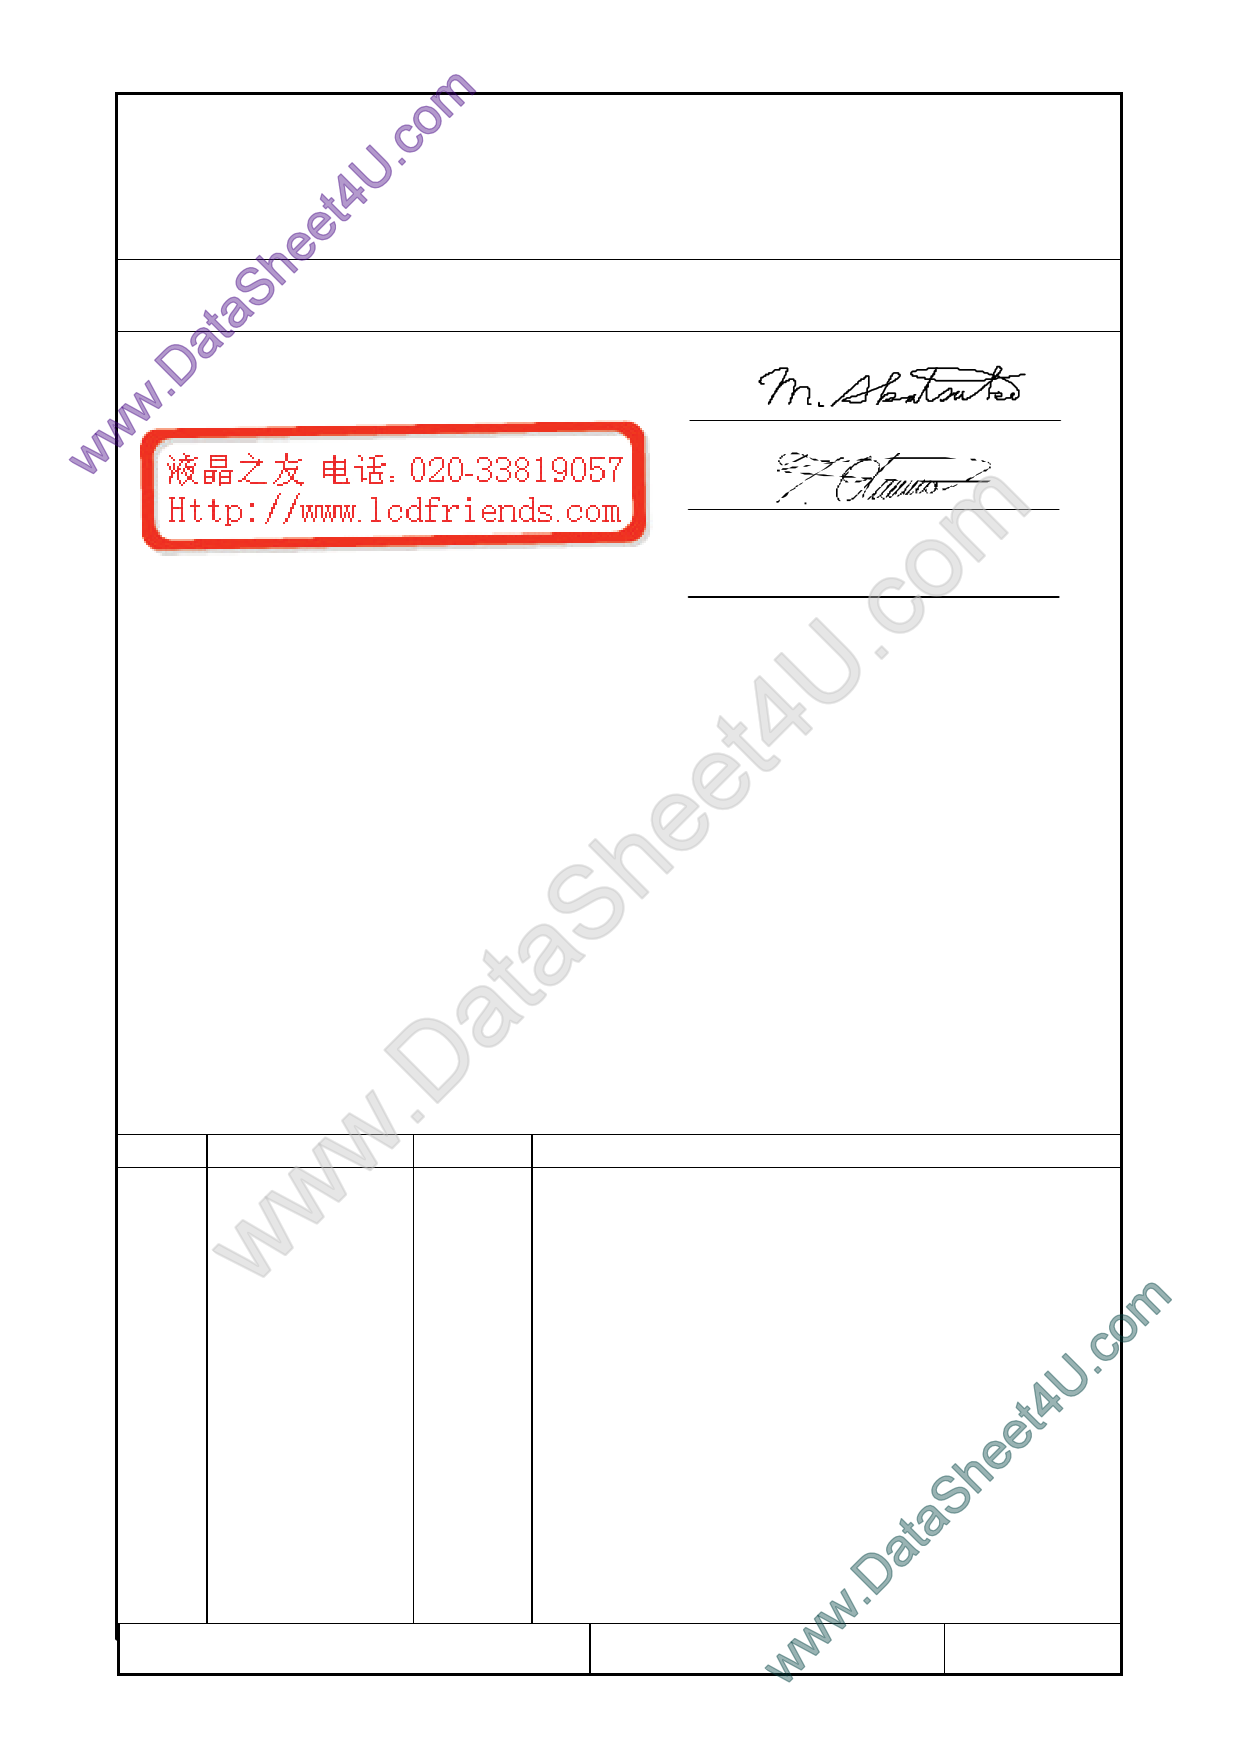 F-51852GNFQJ-LY-ADN Даташит, Описание, Даташиты